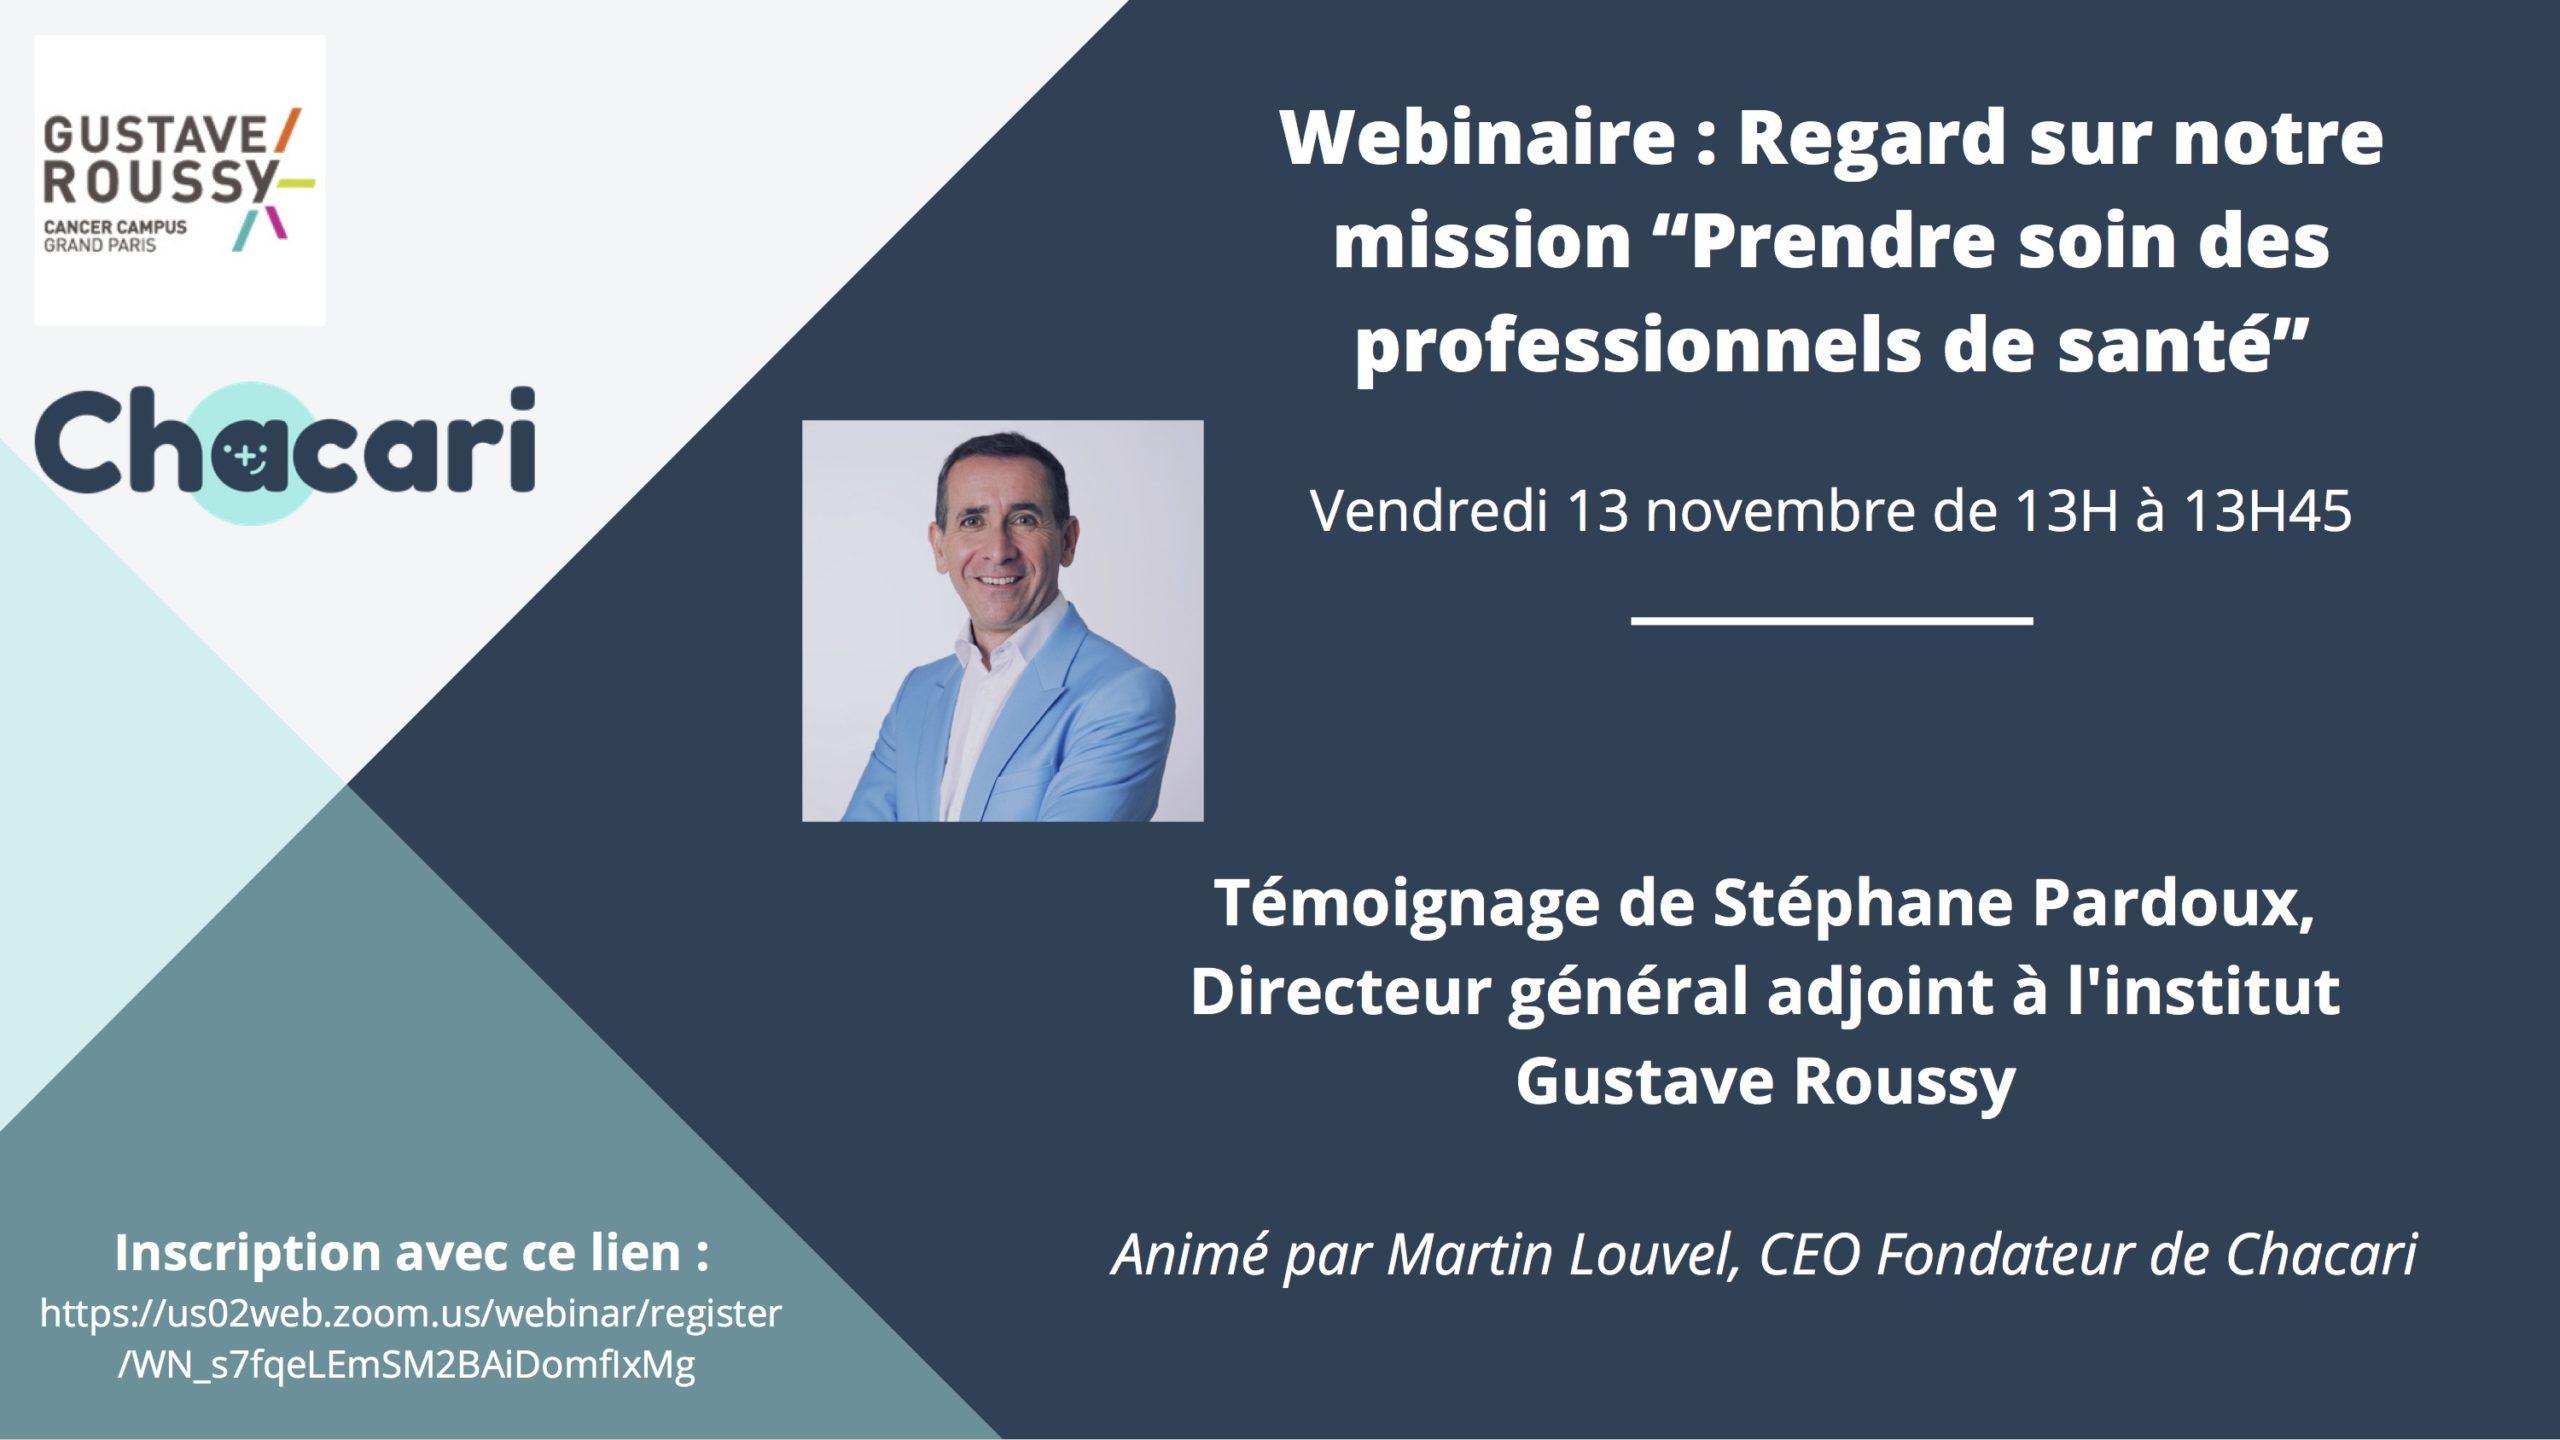 Webinaire Stephane Pardoux